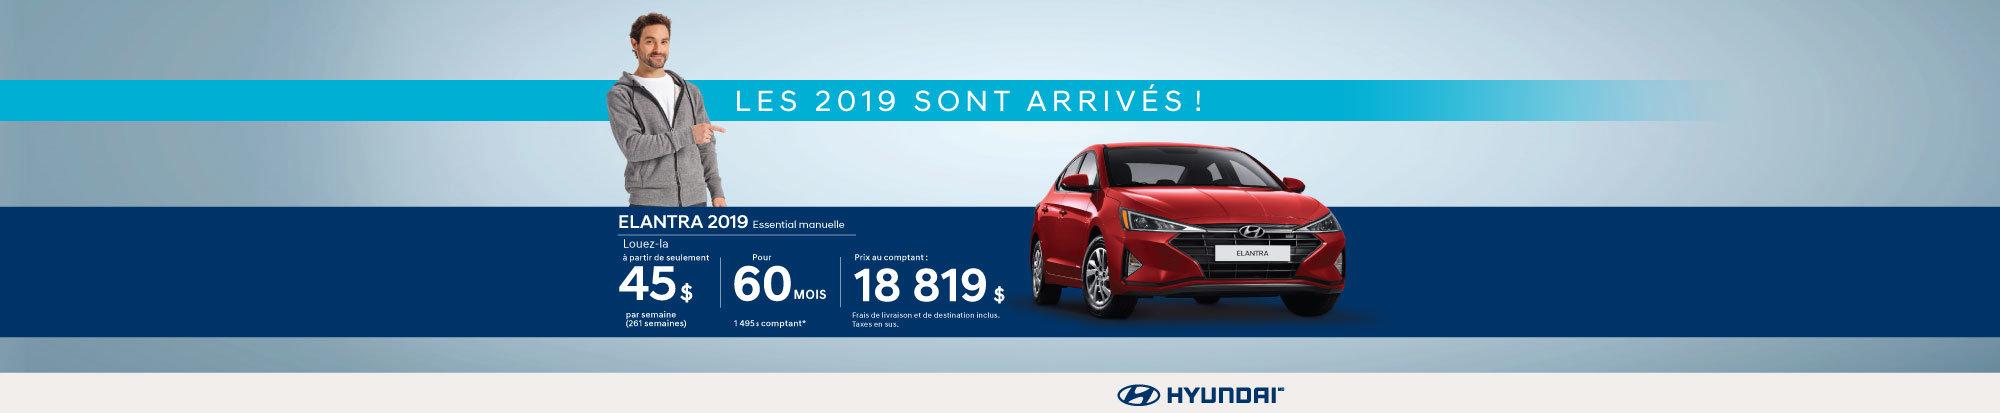 Nos Hyundai Elantra 2019 sont arrivées! web